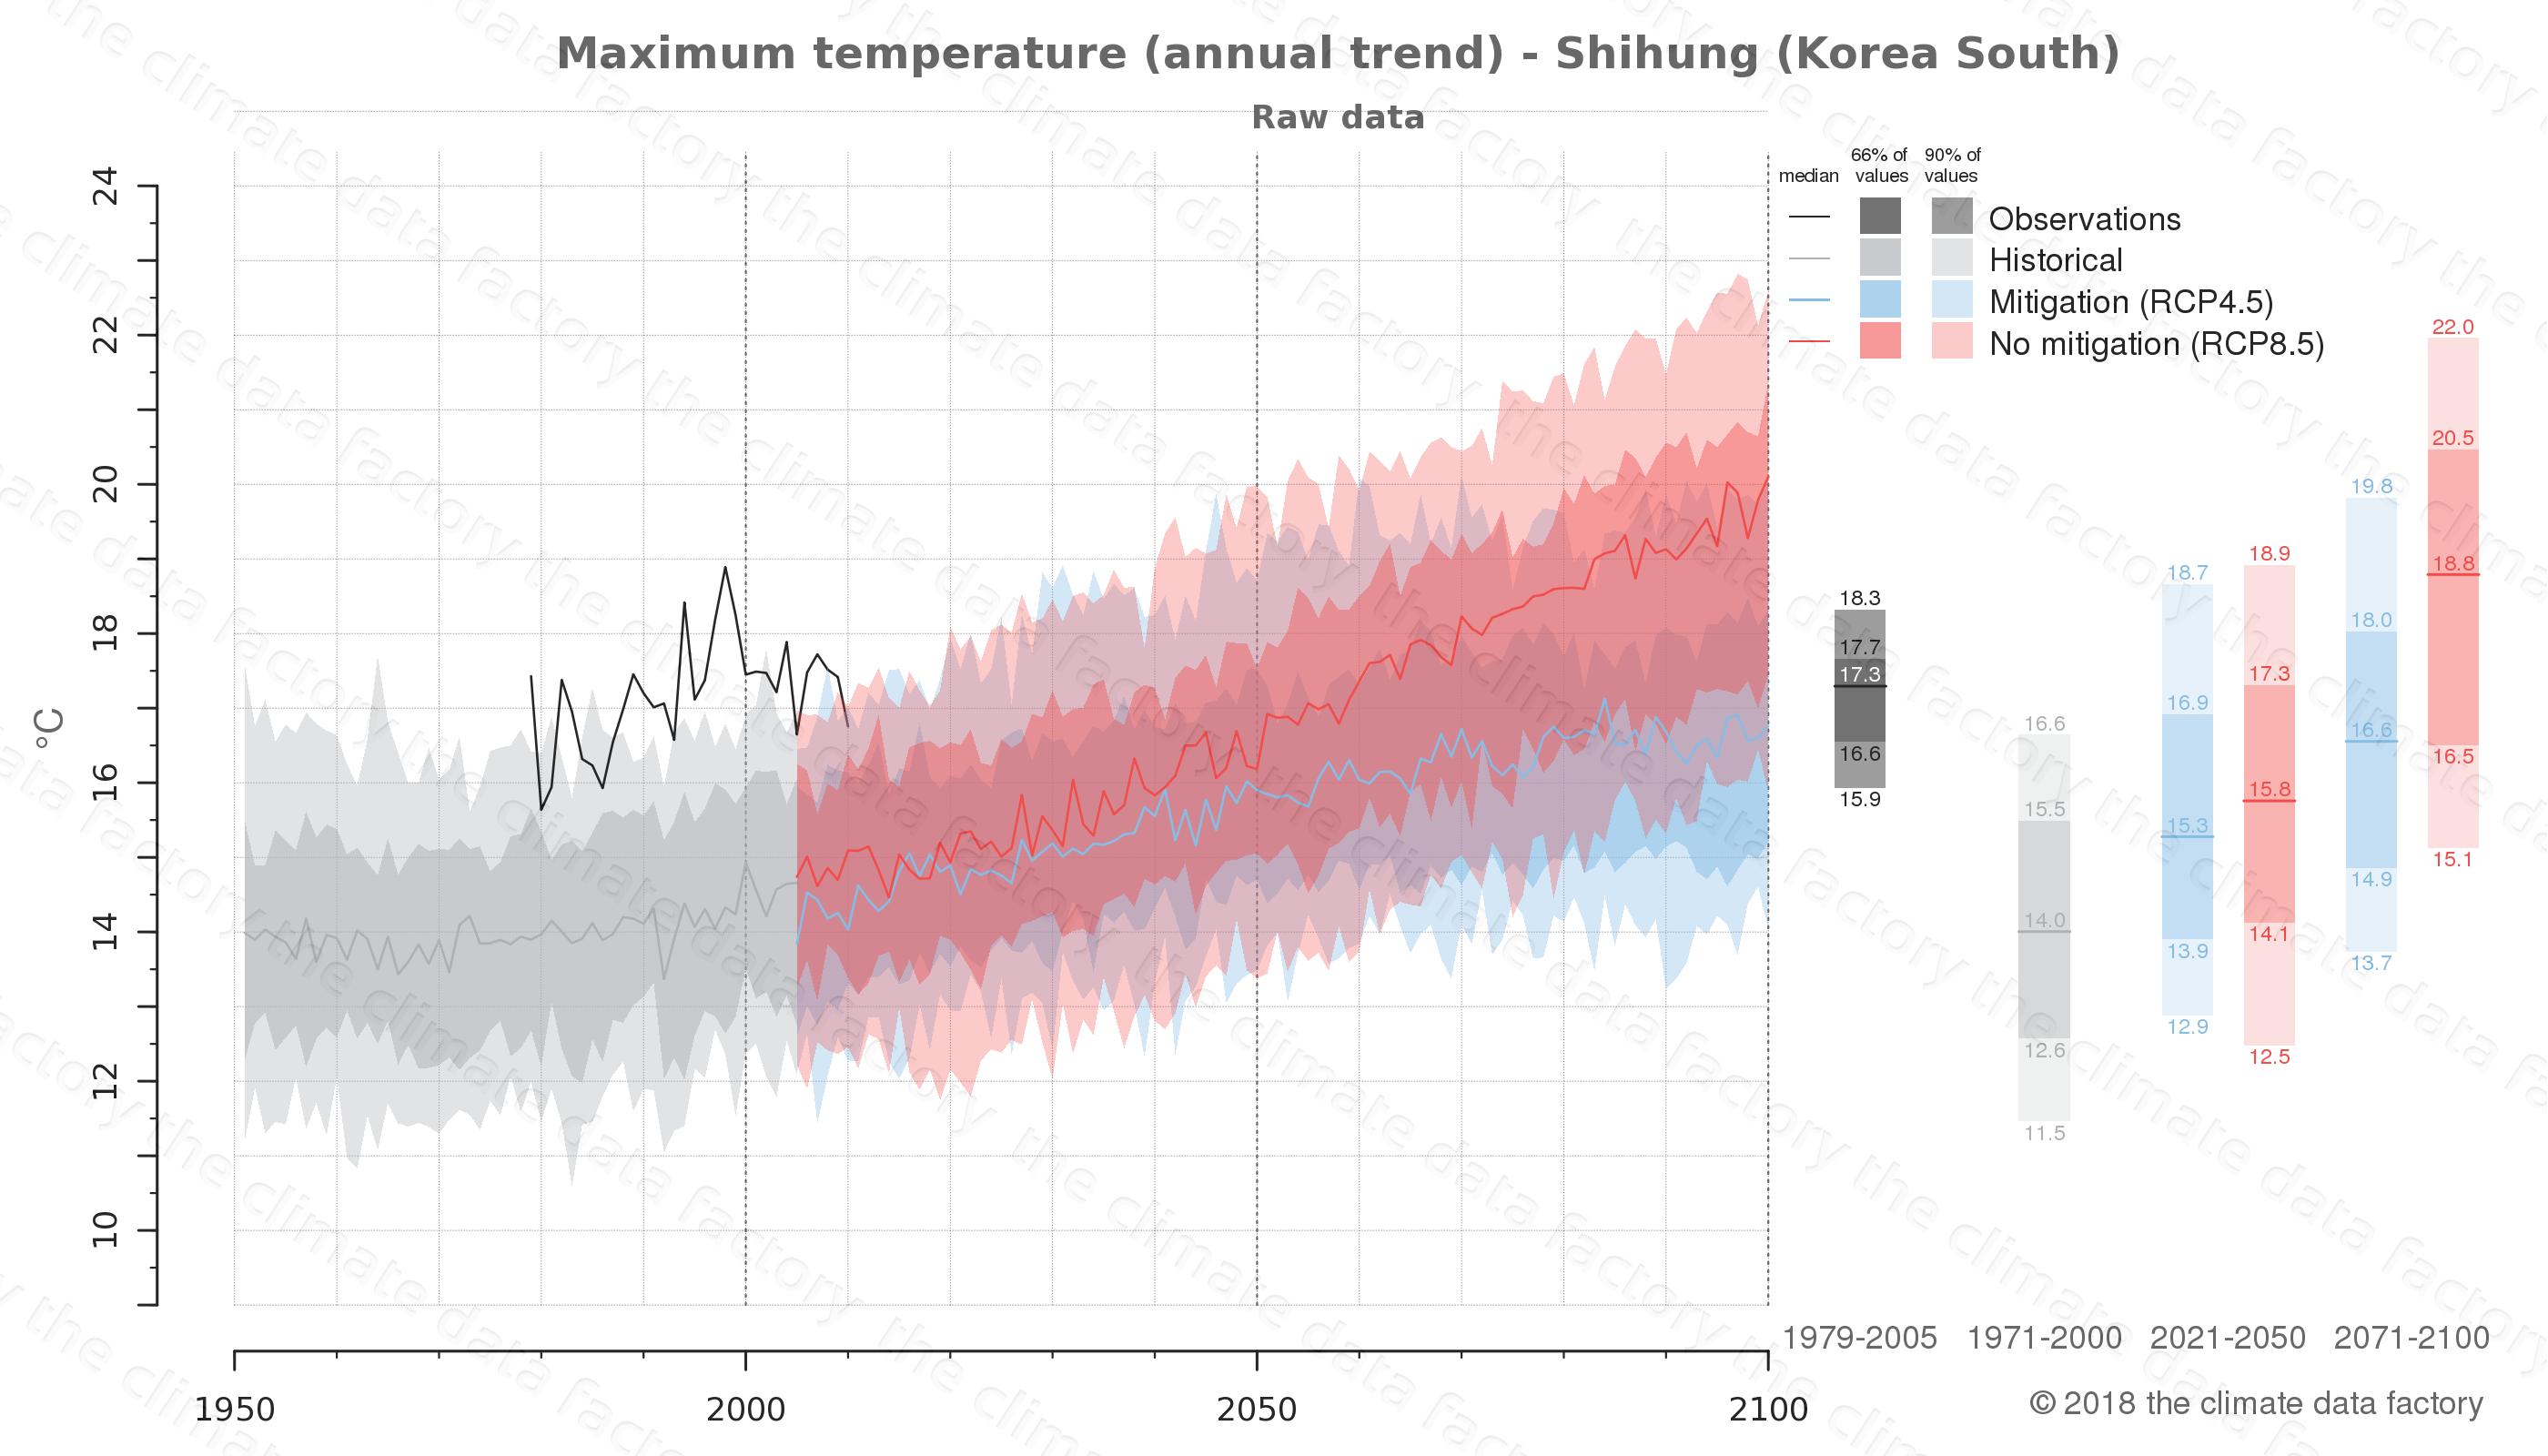 climate change data policy adaptation climate graph city data maximum-temperature shihung south korea